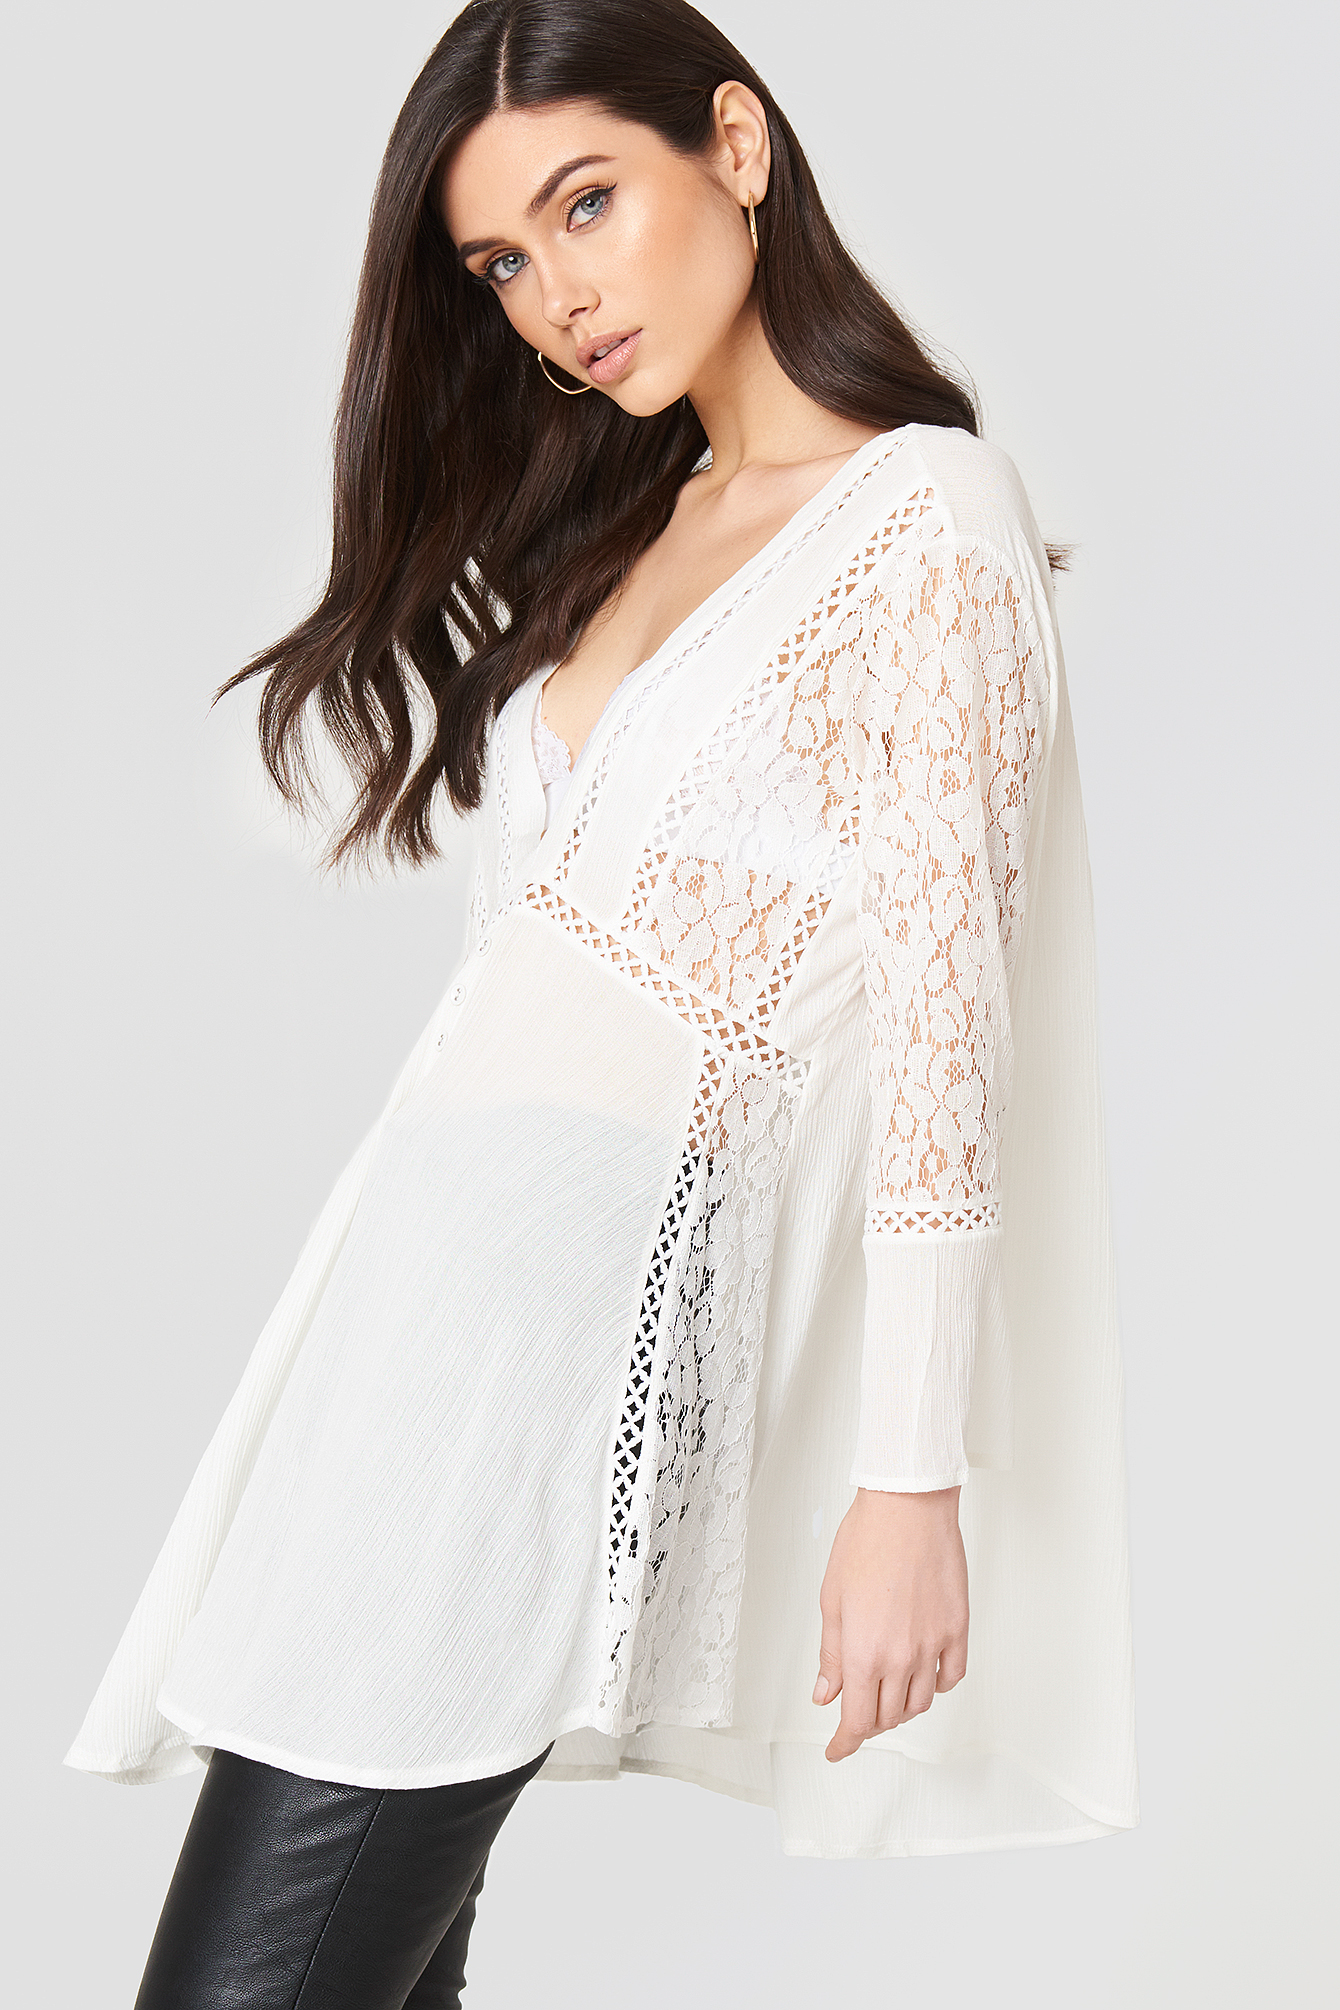 REVERSE A CERTAIN ROMANCE DRESS - WHITE, OFFWHITE